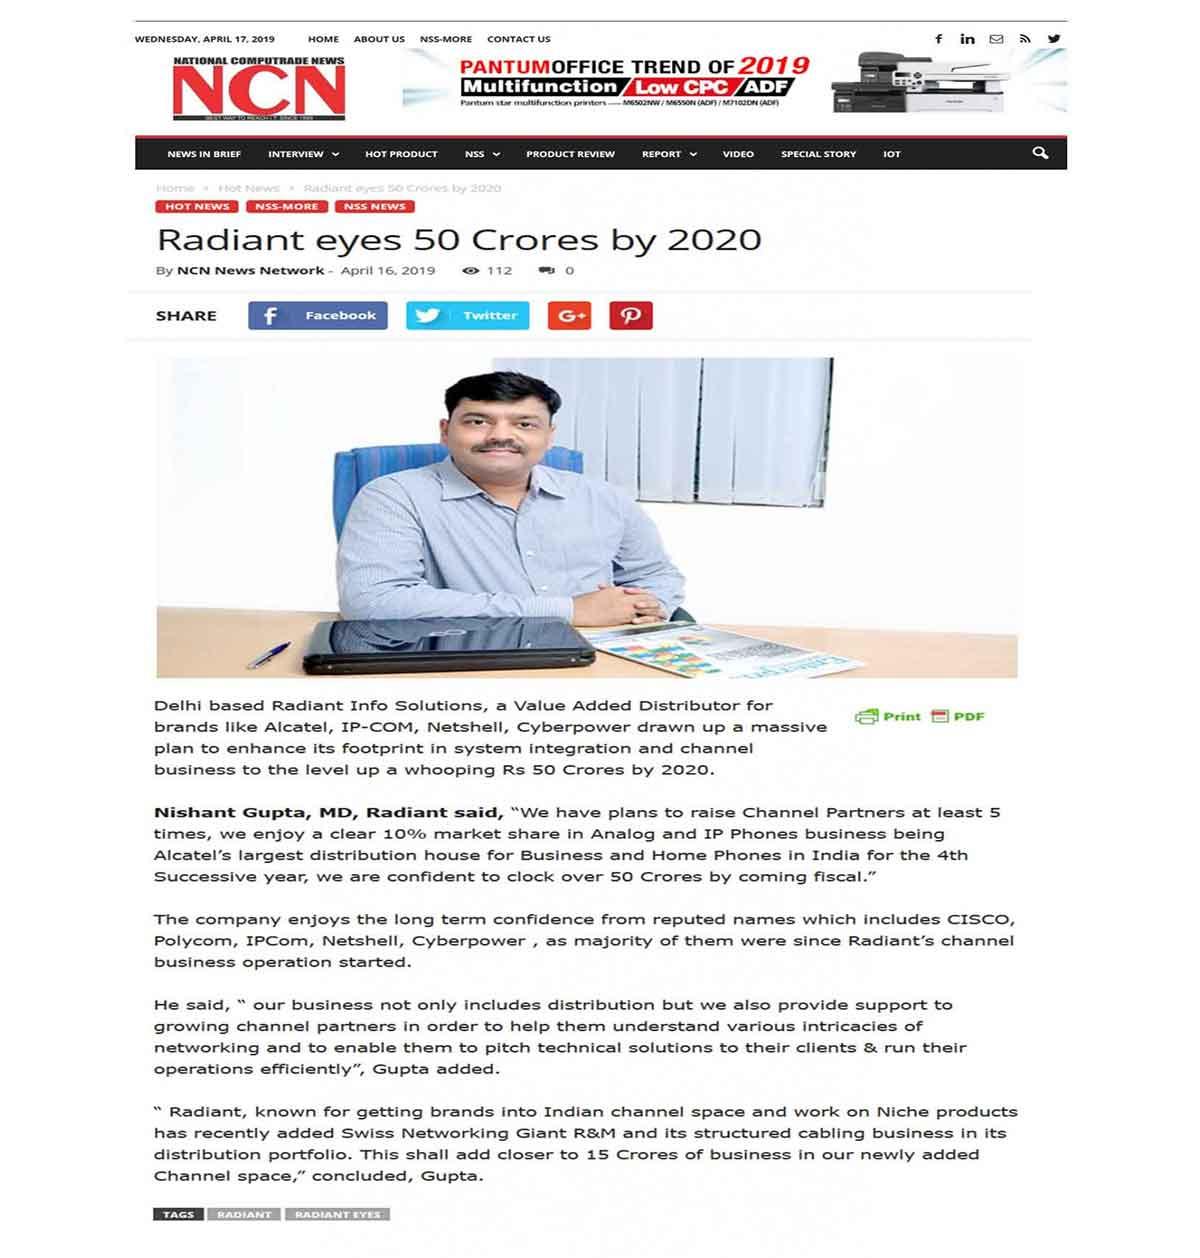 ncn-news-radiant-eyes-50-crores-by-2020